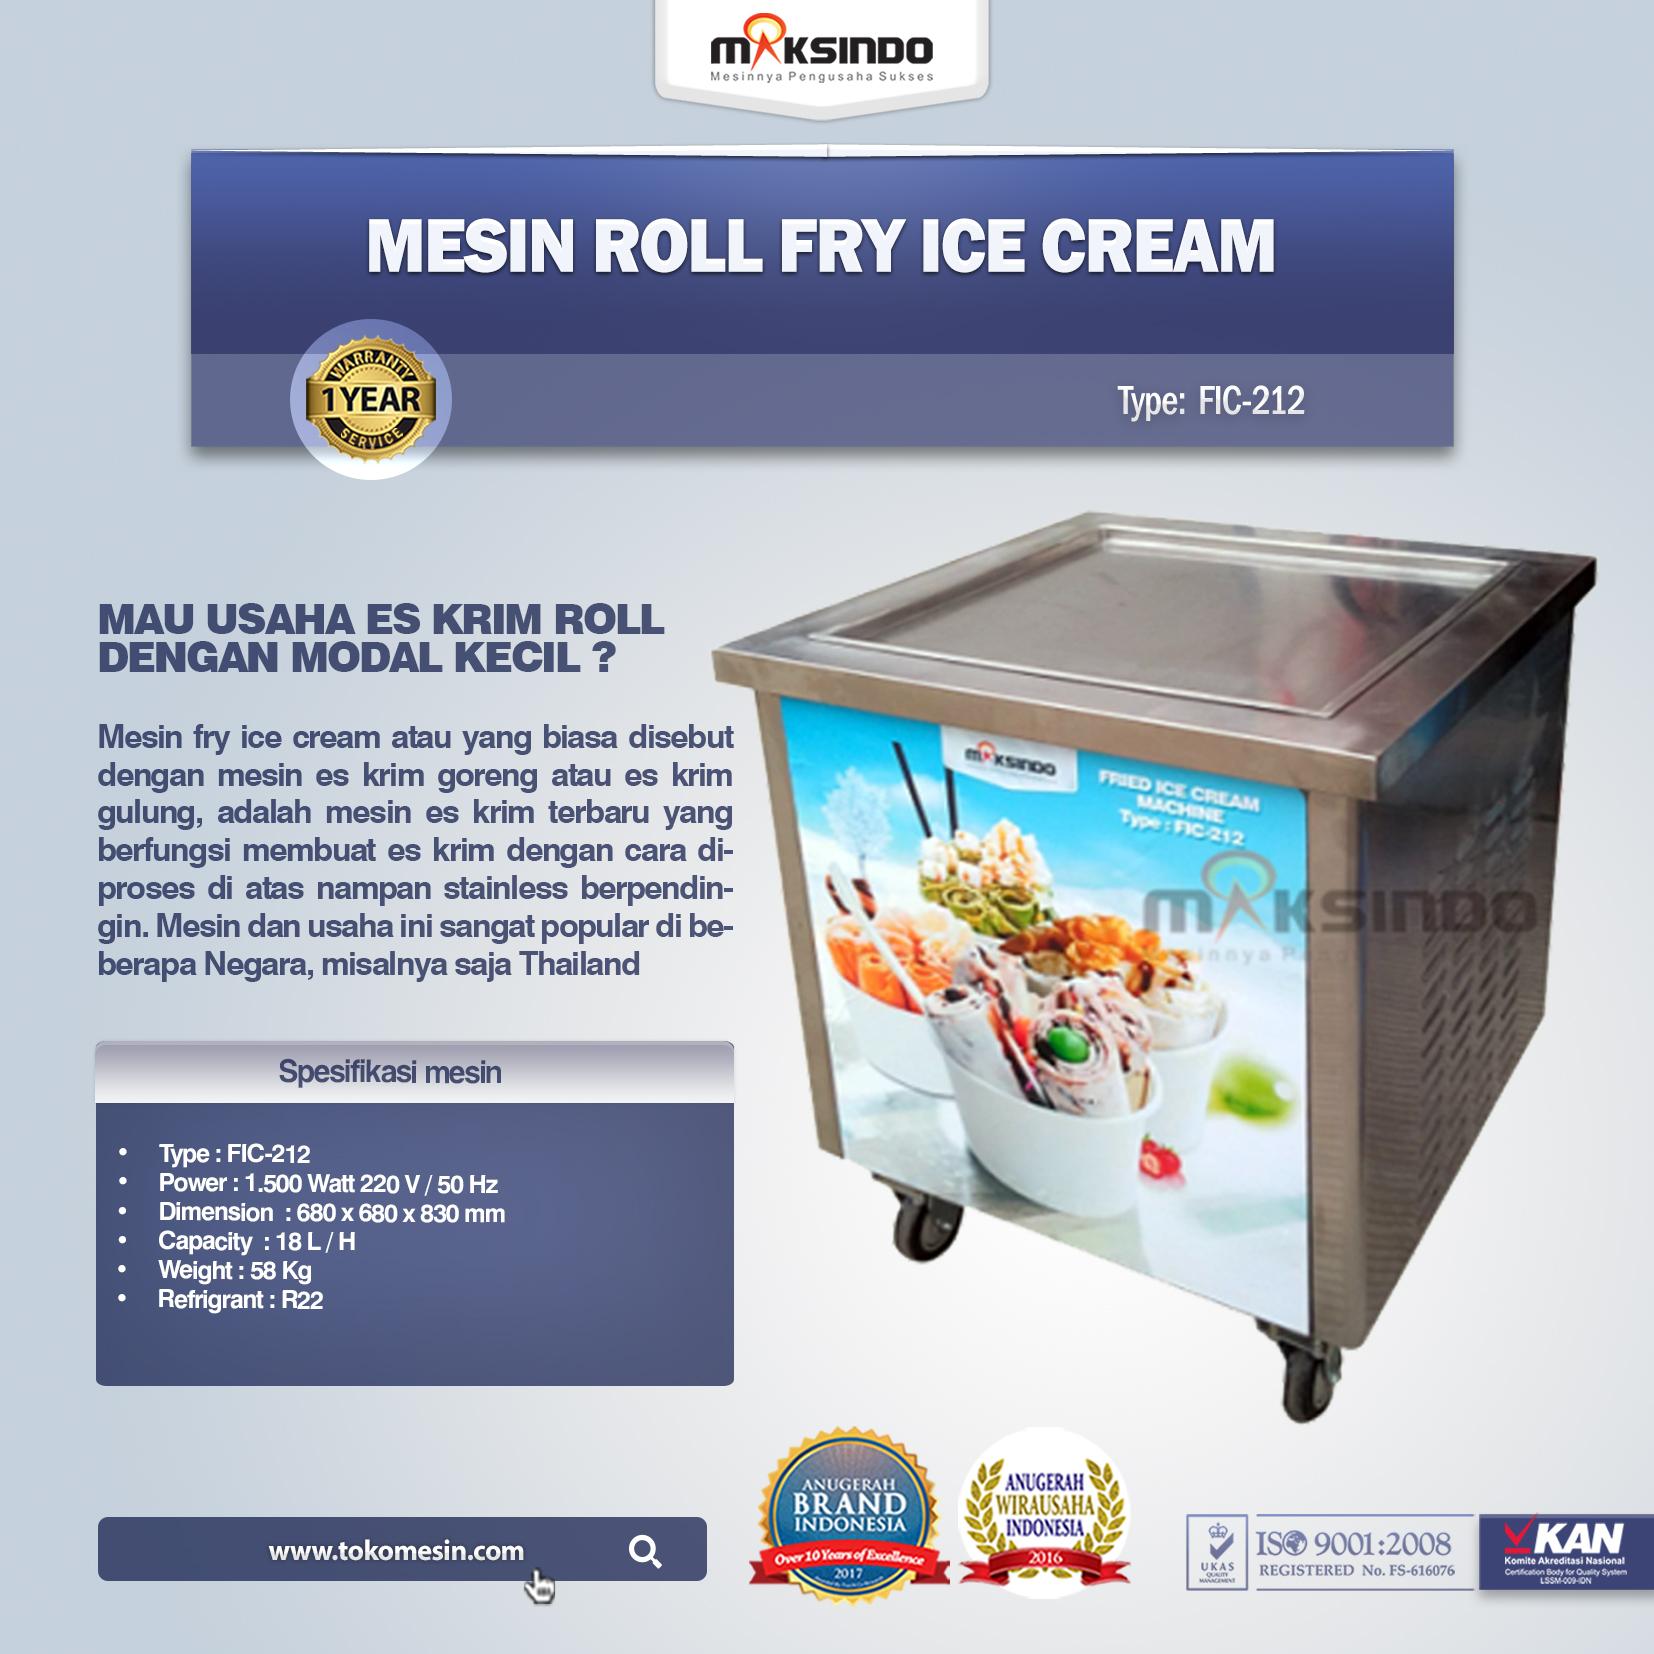 Mesin Roll Fry Ice Cream ( FIC-212 )